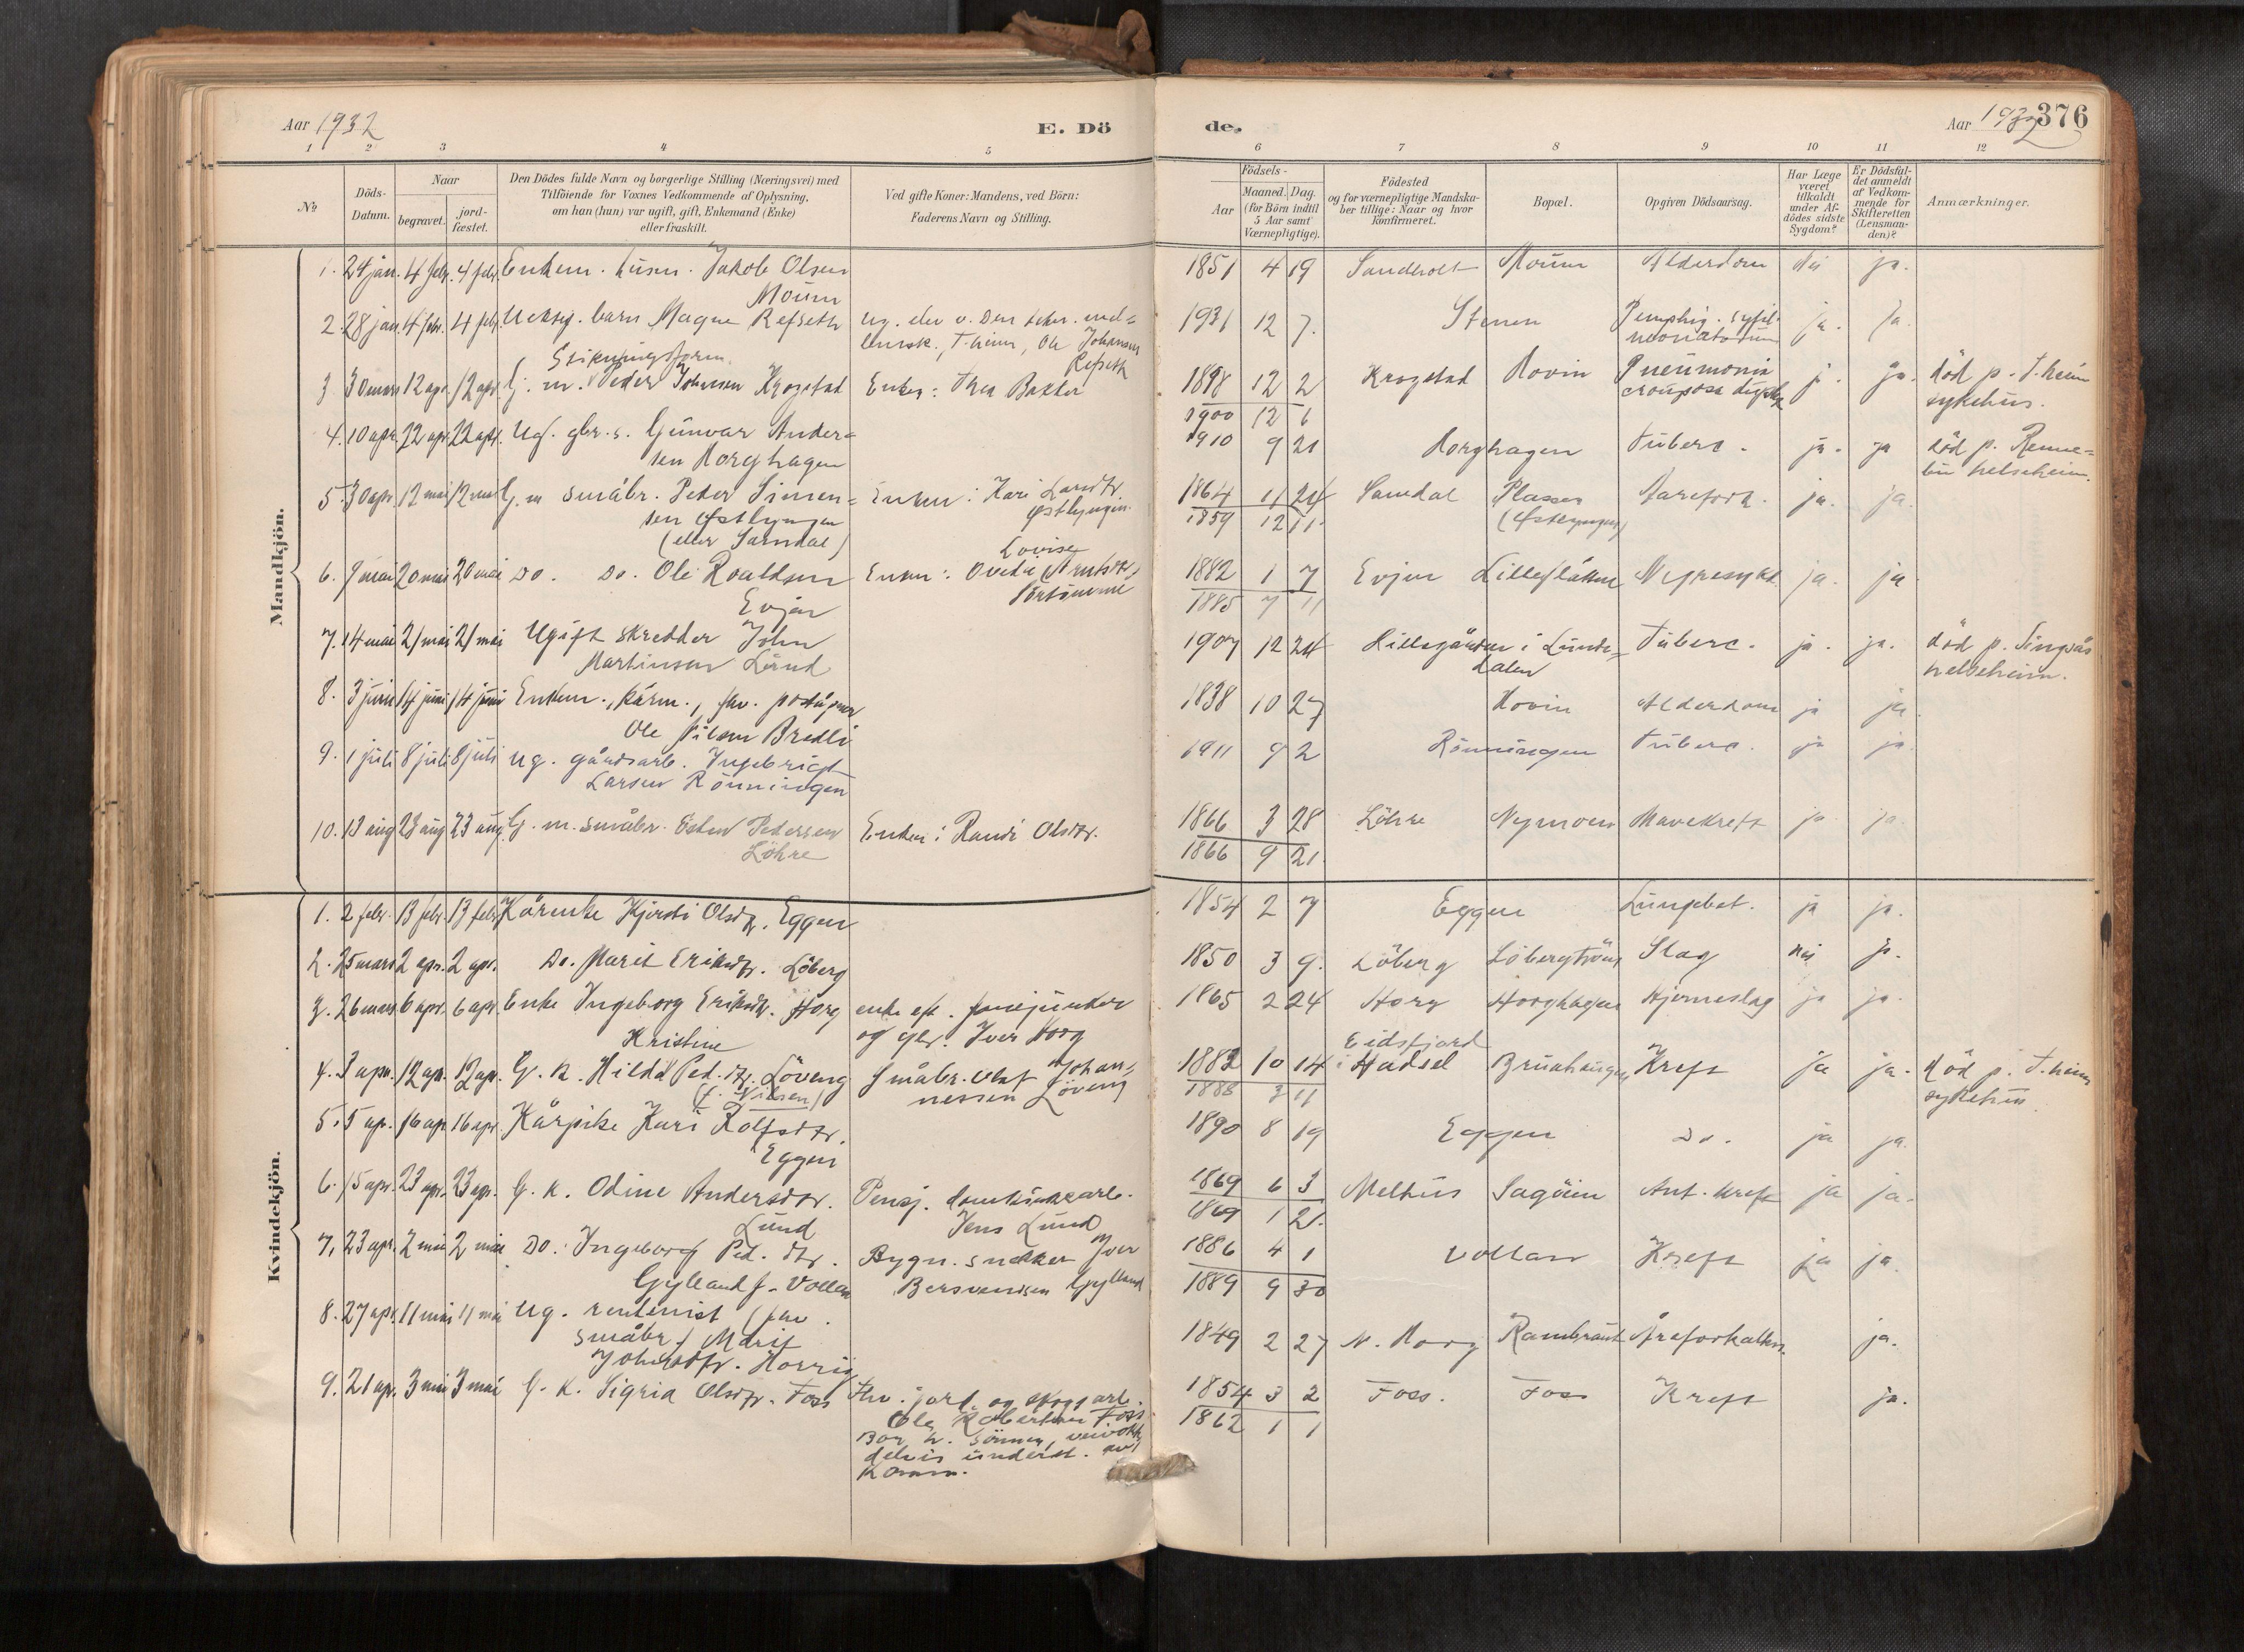 SAT, Ministerialprotokoller, klokkerbøker og fødselsregistre - Sør-Trøndelag, 692/L1105b: Parish register (official) no. 692A06, 1891-1934, p. 376